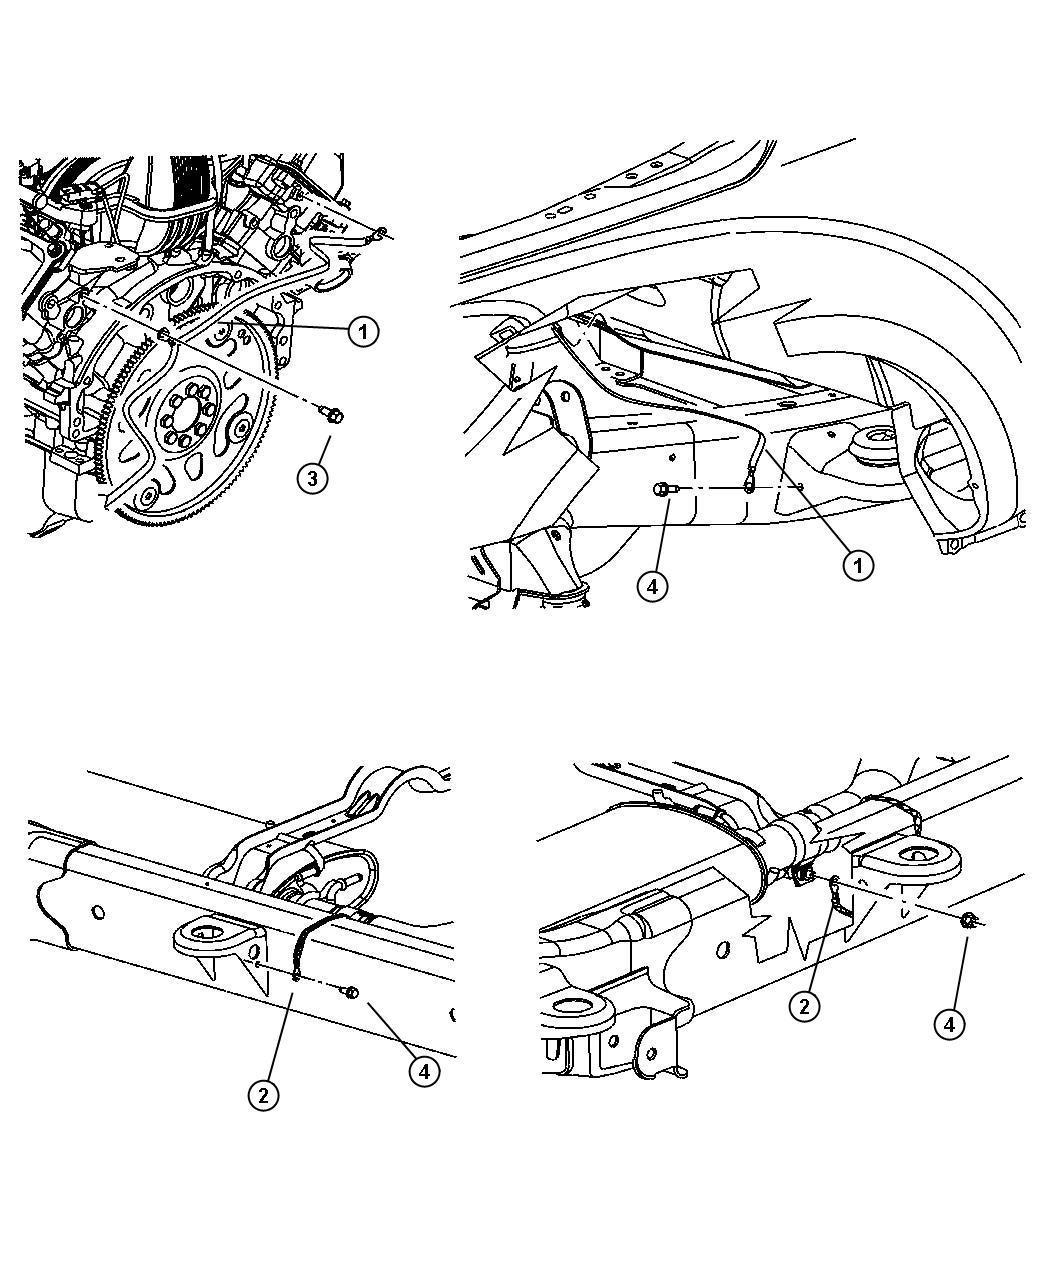 Dodge Durango 4x4 5 7l Hemi Multi Displacement 5 Spd